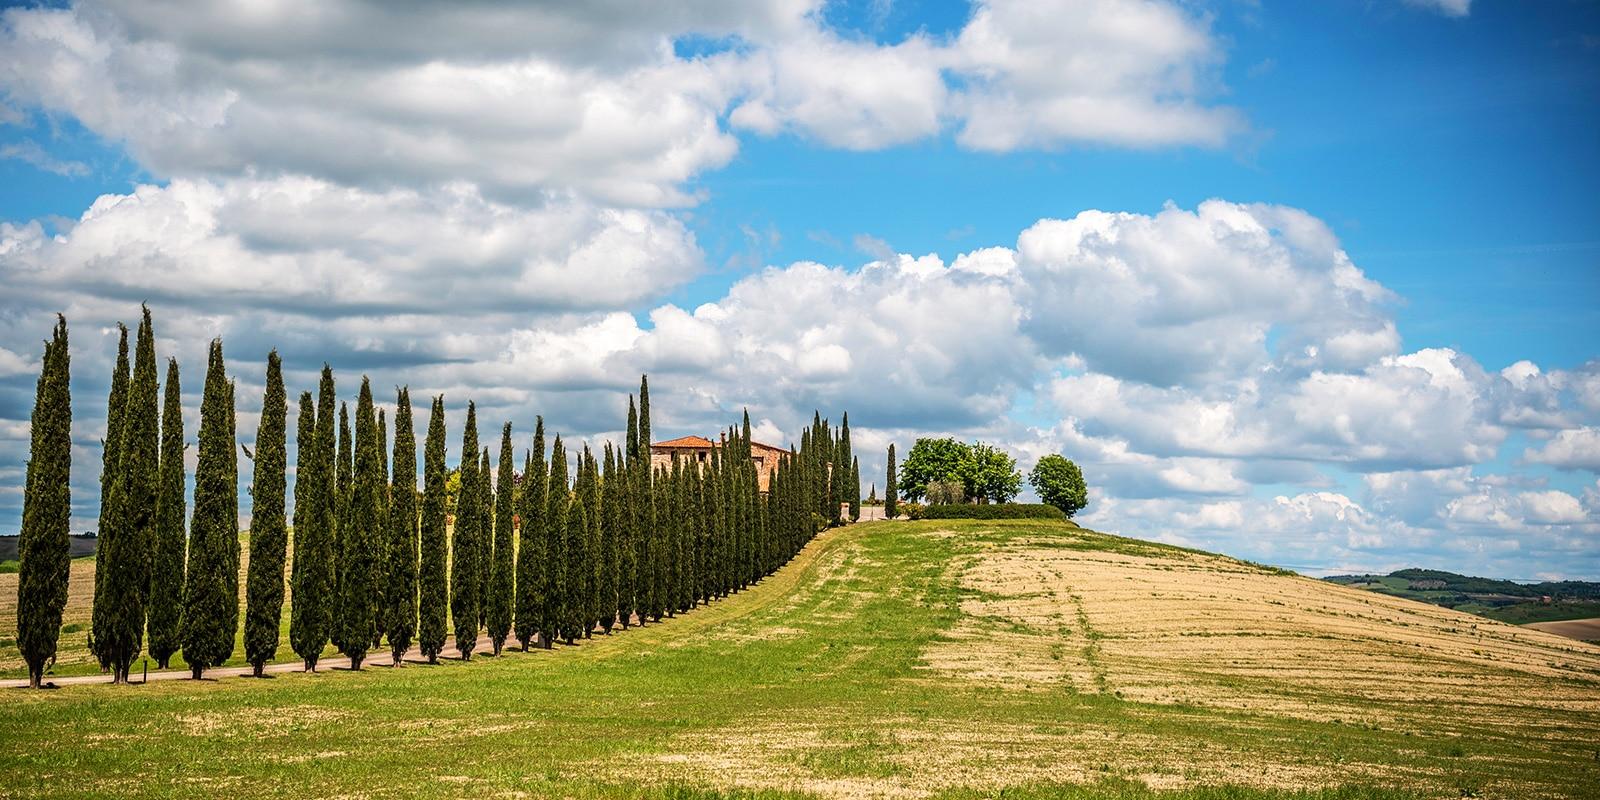 Mille Miglia Toscana